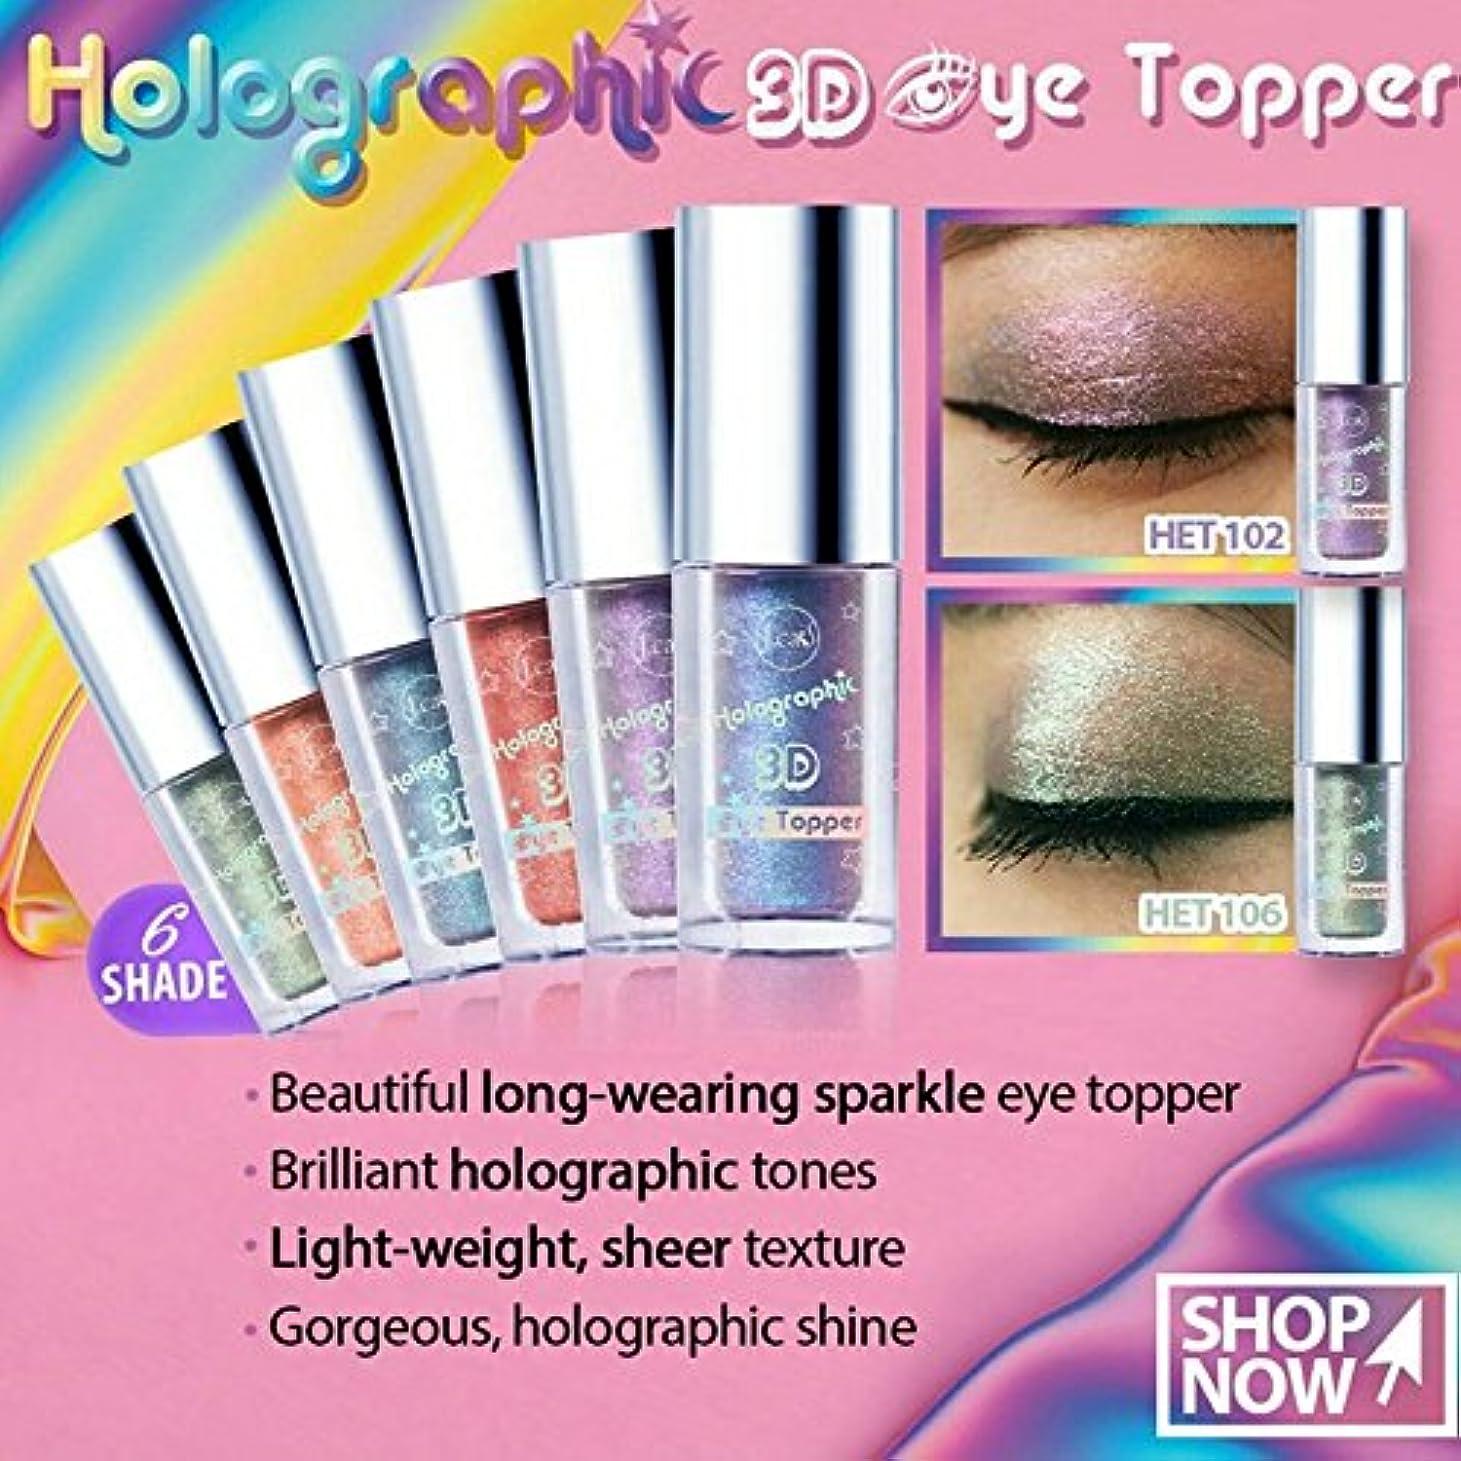 J. CAT BEAUTY Holographic 3d Eye Topper - Viridian (並行輸入品)